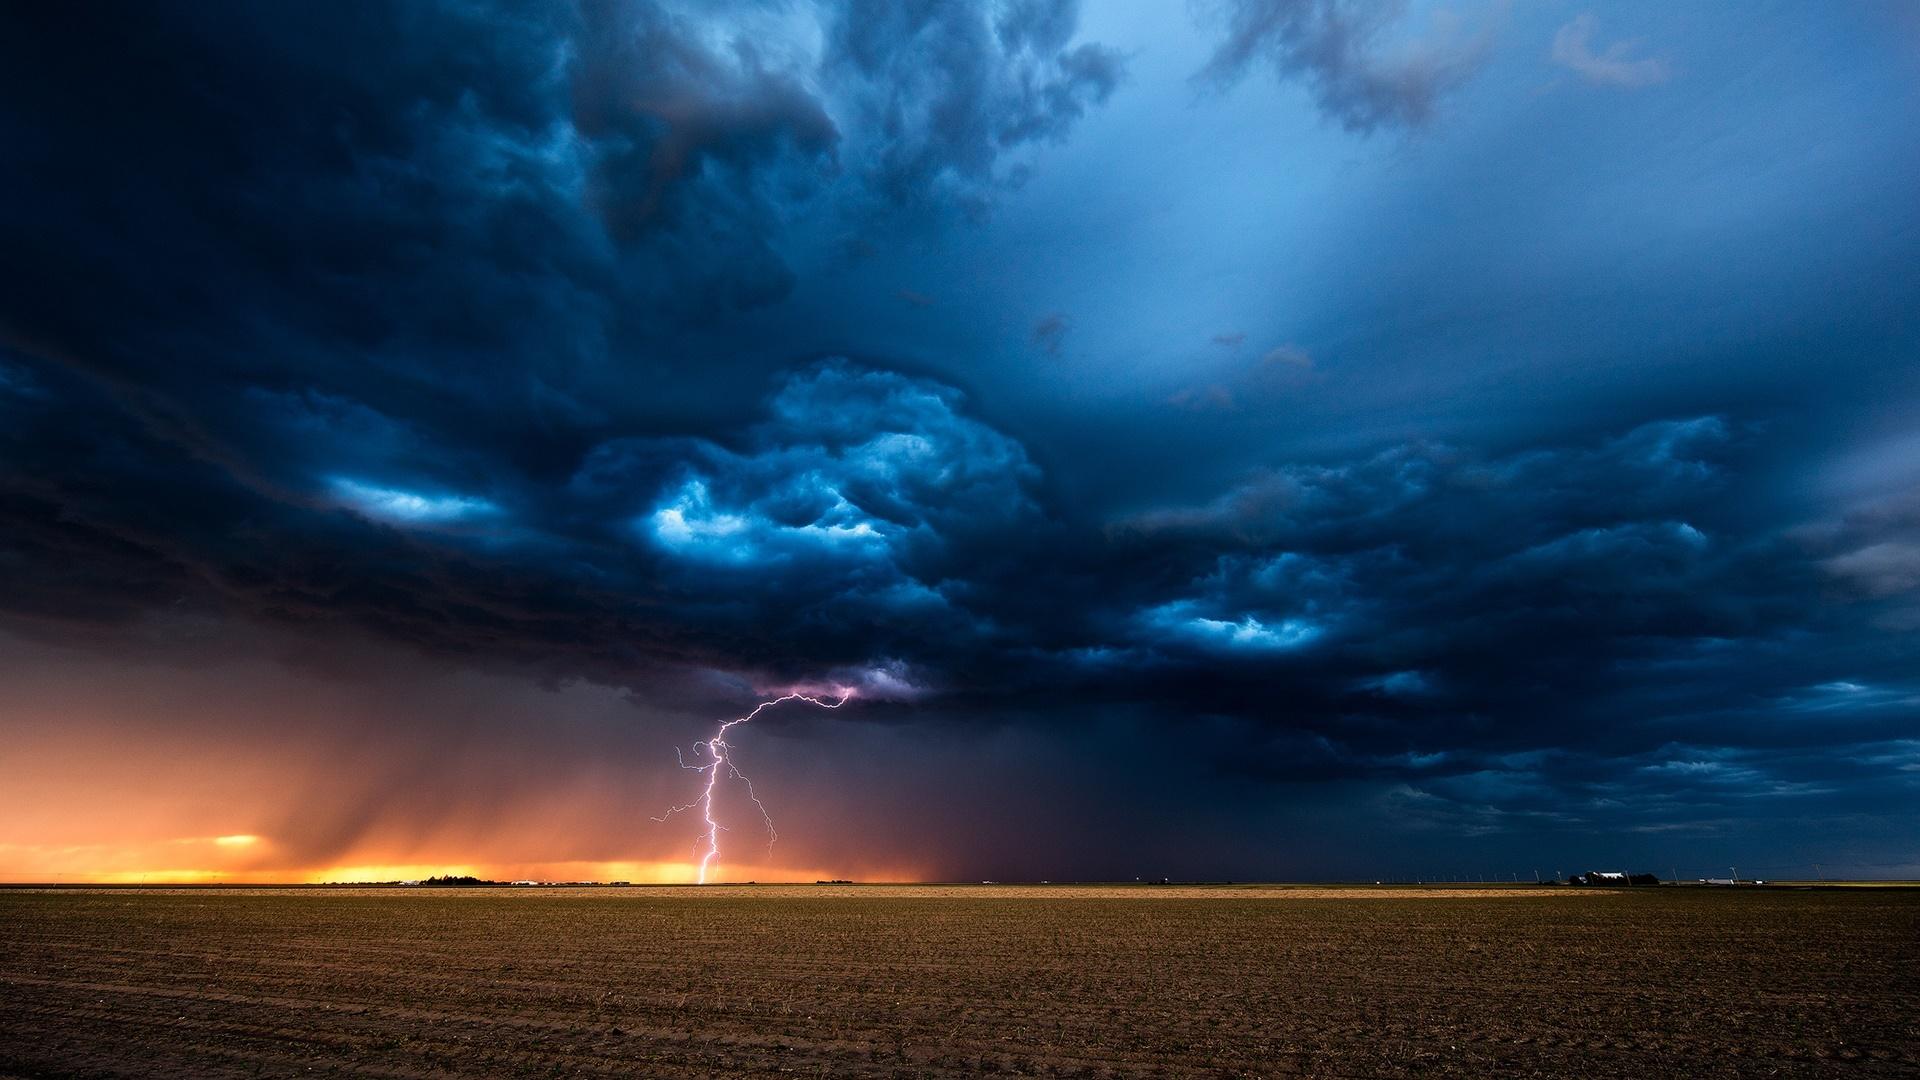 Thunderstorm in the field wallpaper